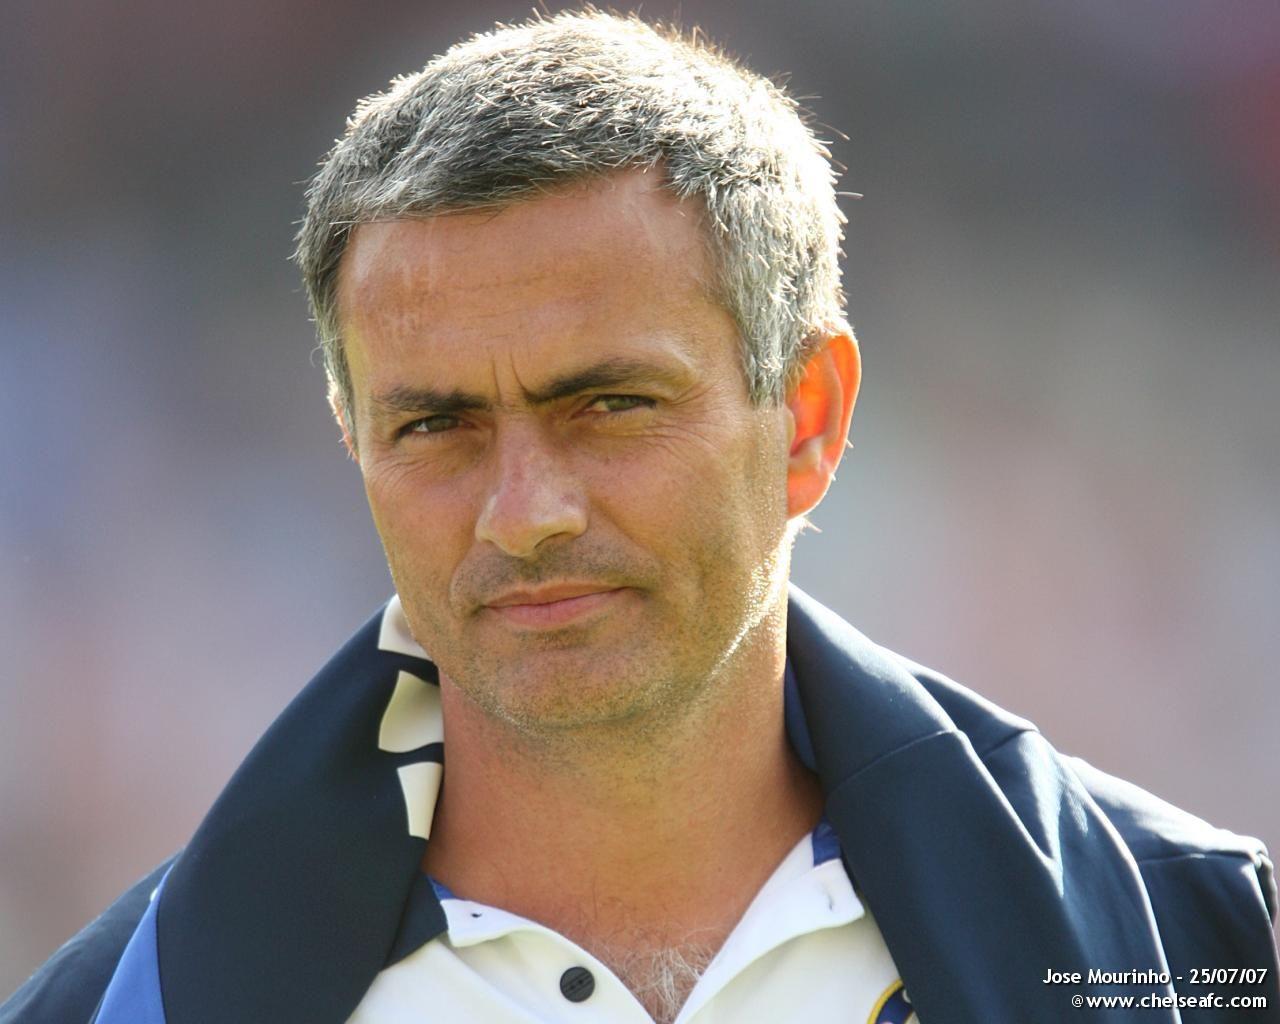 Jose Mourinho José mourinho, Latest news today, Jose